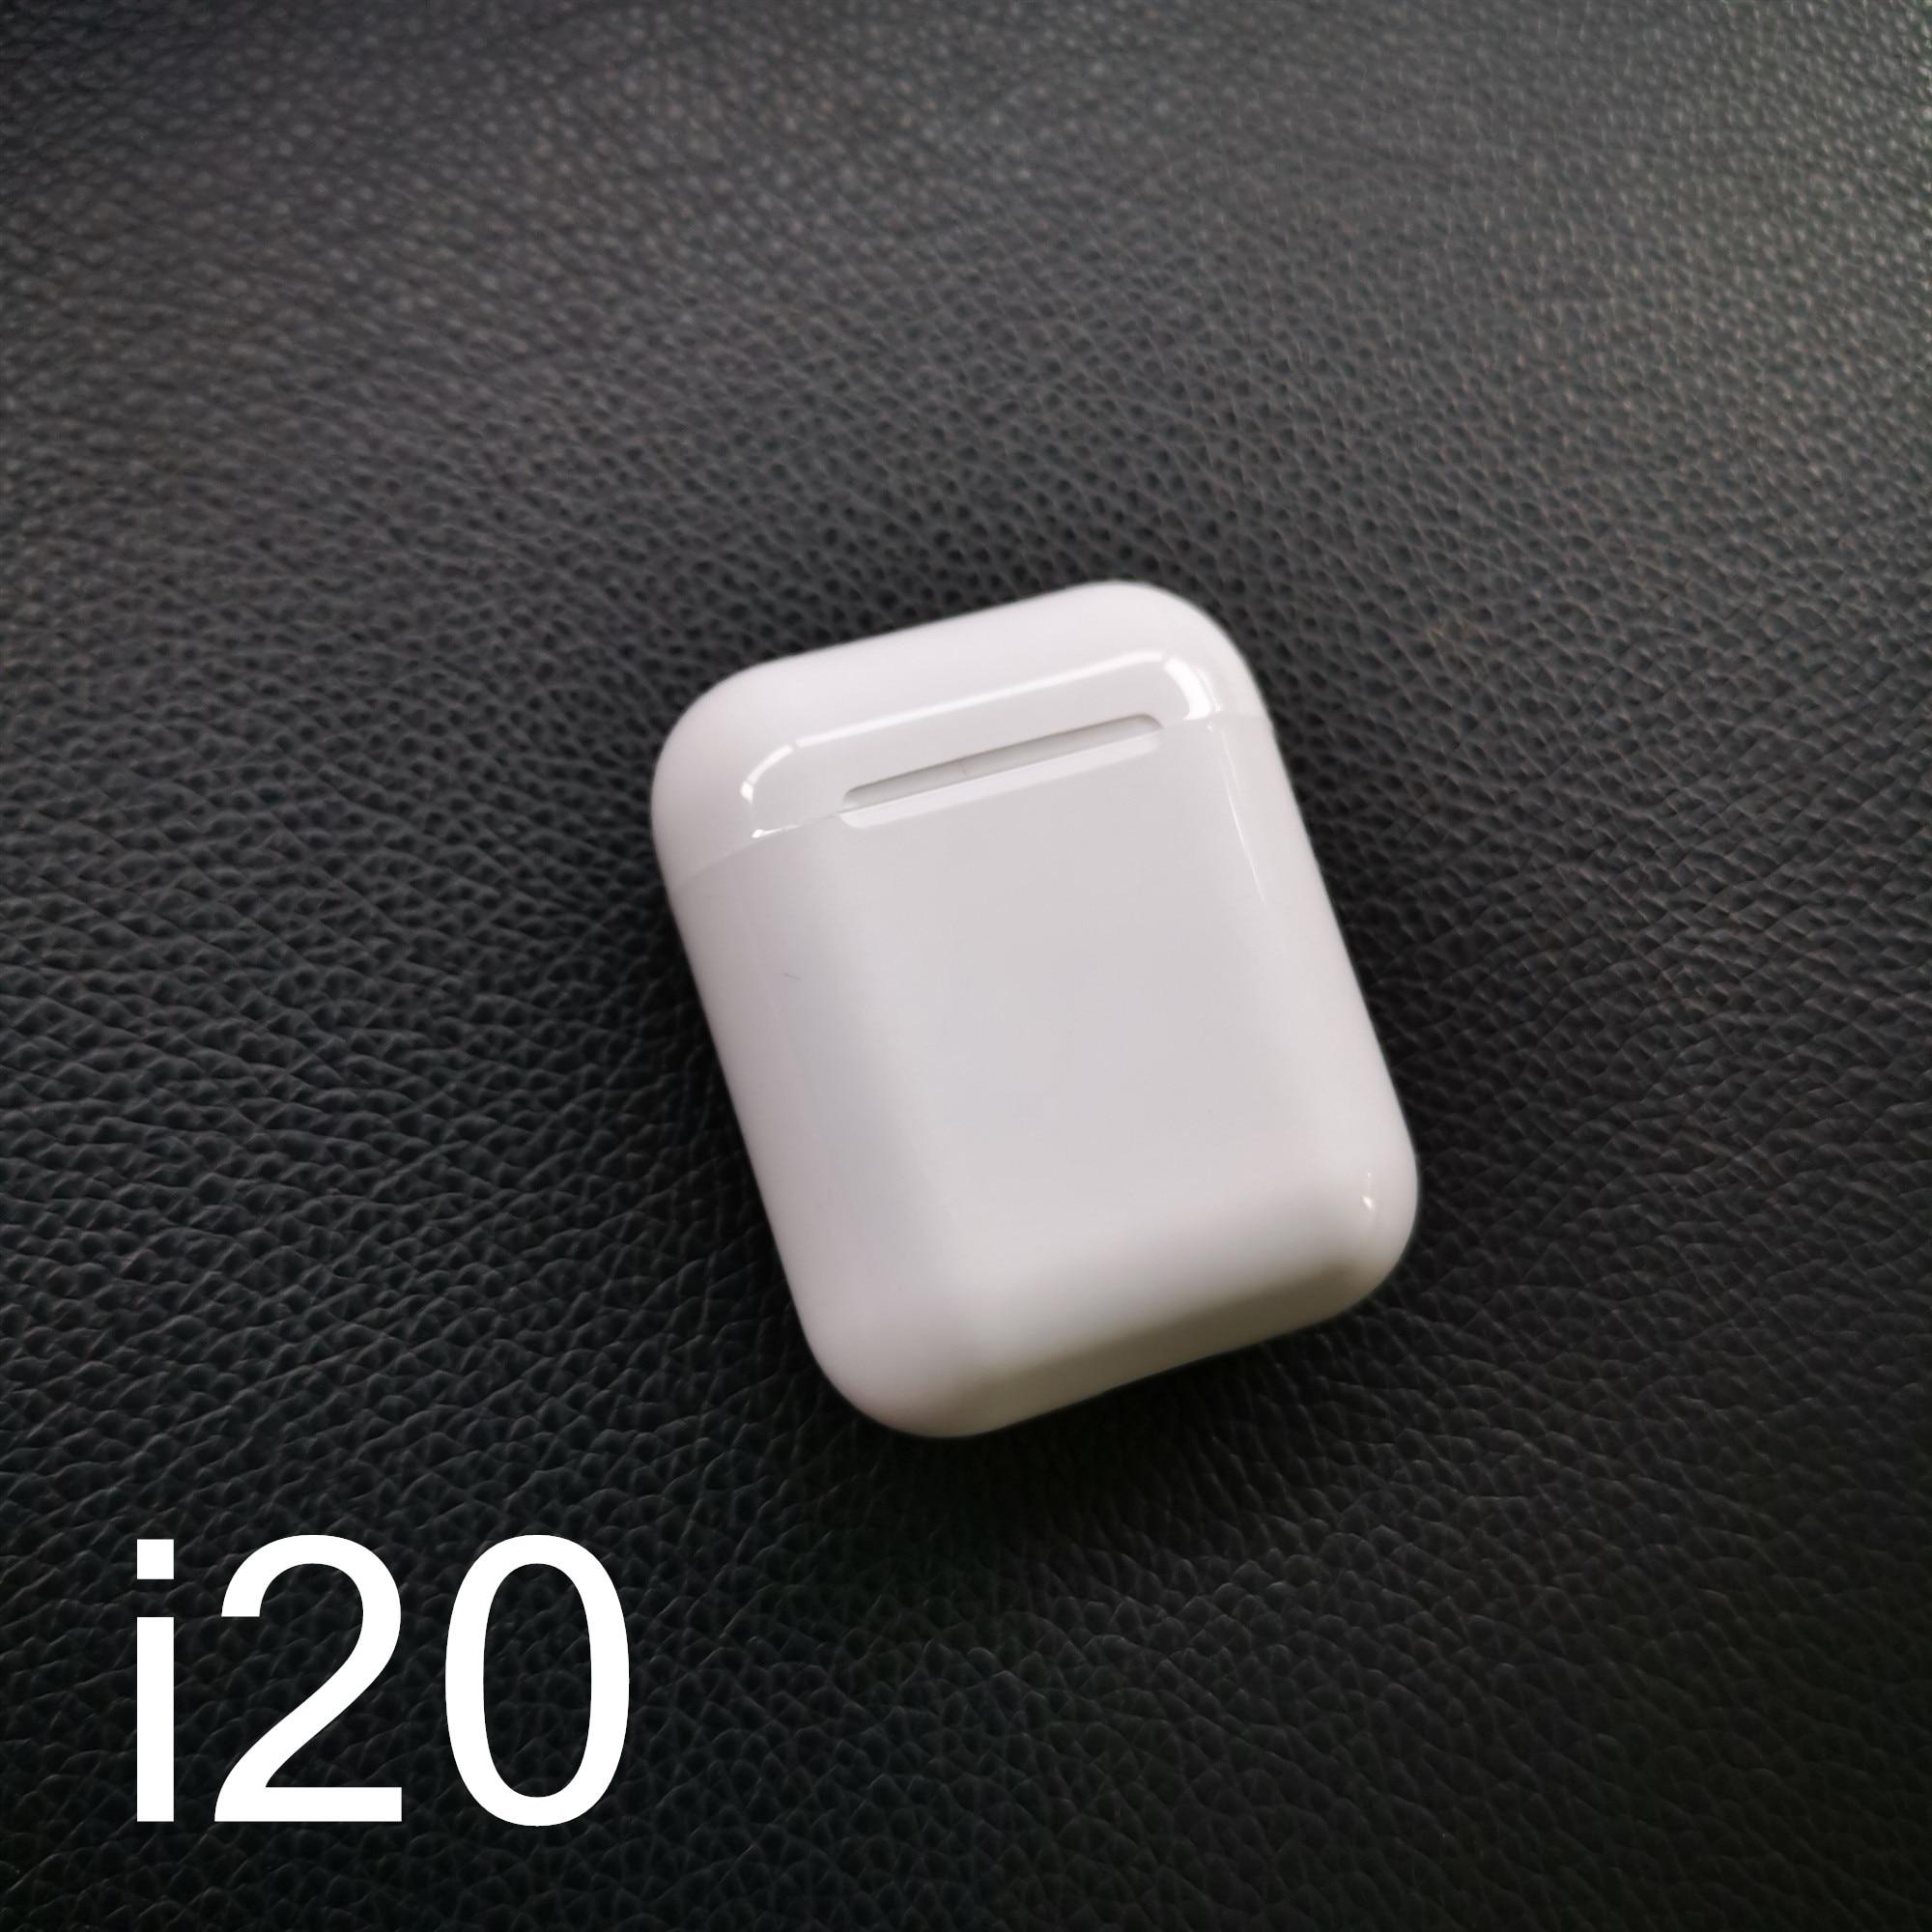 I20 наушники вкладыши TWS Bluetooth ухо воздуха XY Беспроводной PK w1 чип наушники 11 размеры PK i10 i11 LK TE9 LK TE9 i10tws i13 i14 i15 i16 наушники вкладыши tws купить на AliExpress